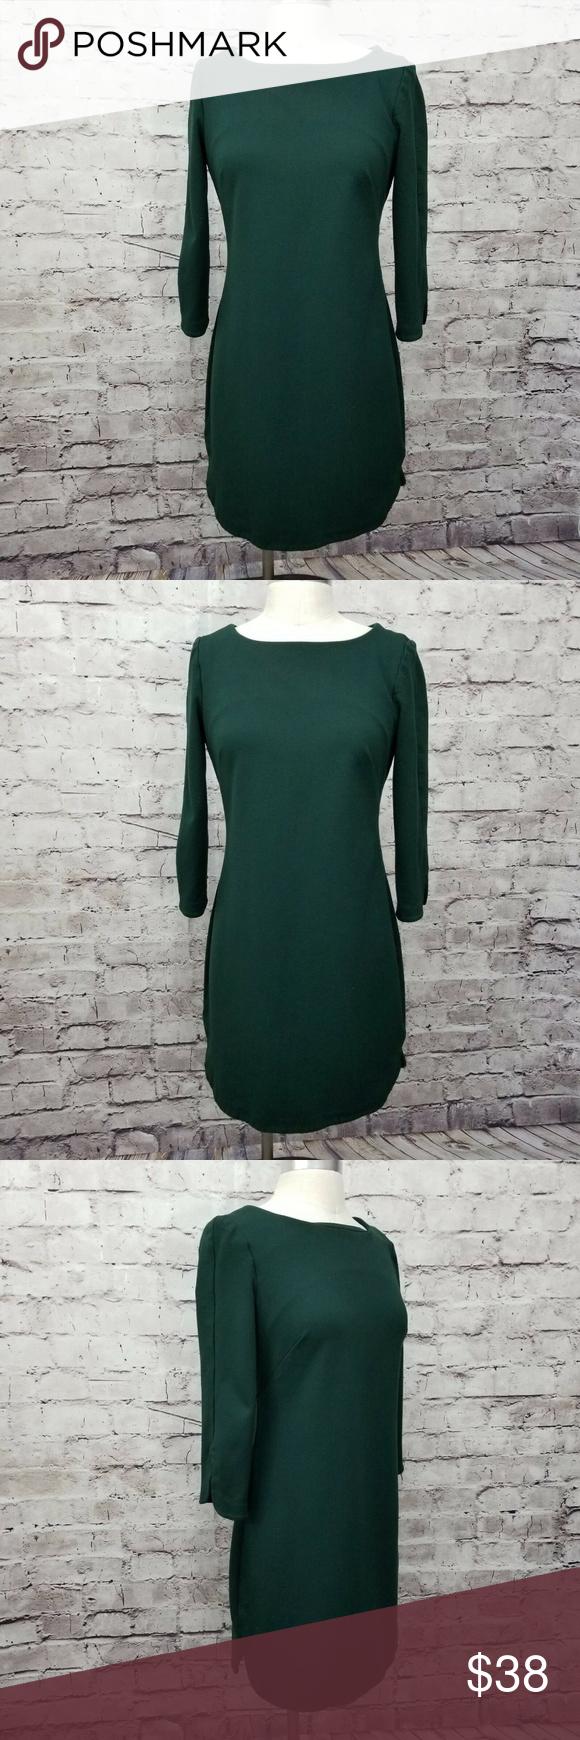 Vince Camuto Green Midi Dress Size 12 Vince Camuto Womens Size 12 Emerald Hunter Green 3 4 Sleeve Split Faced Hem Green Midi Dress Midi Dress Vince Camuto [ 1740 x 580 Pixel ]